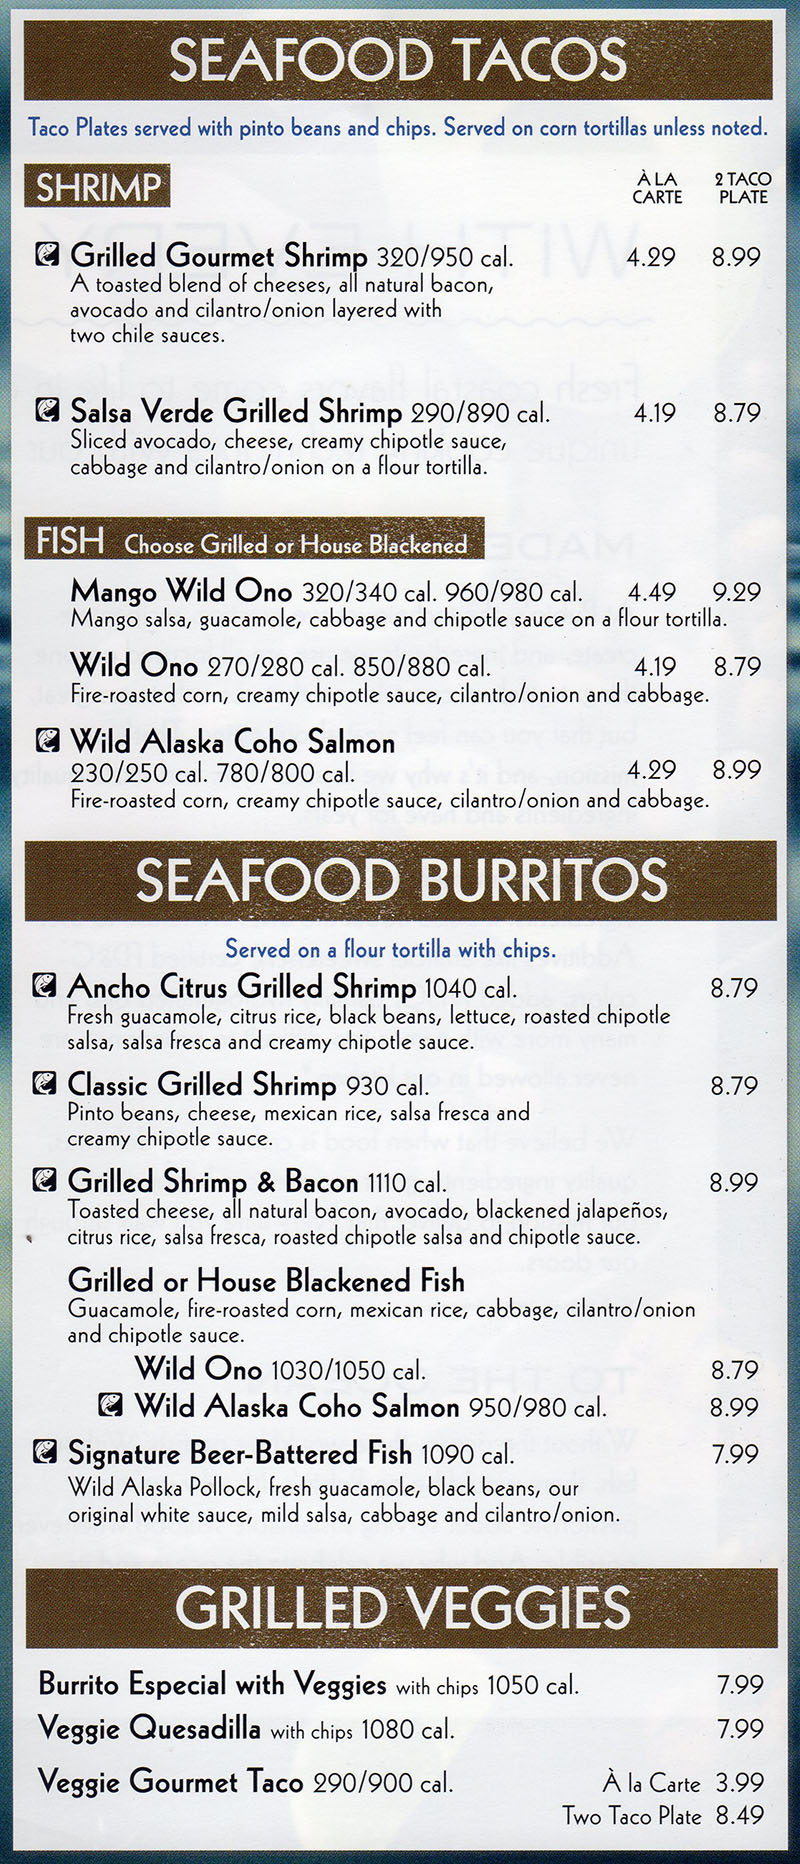 Rubio's menu - seafood tacos, seafood burritos, grilled veggies